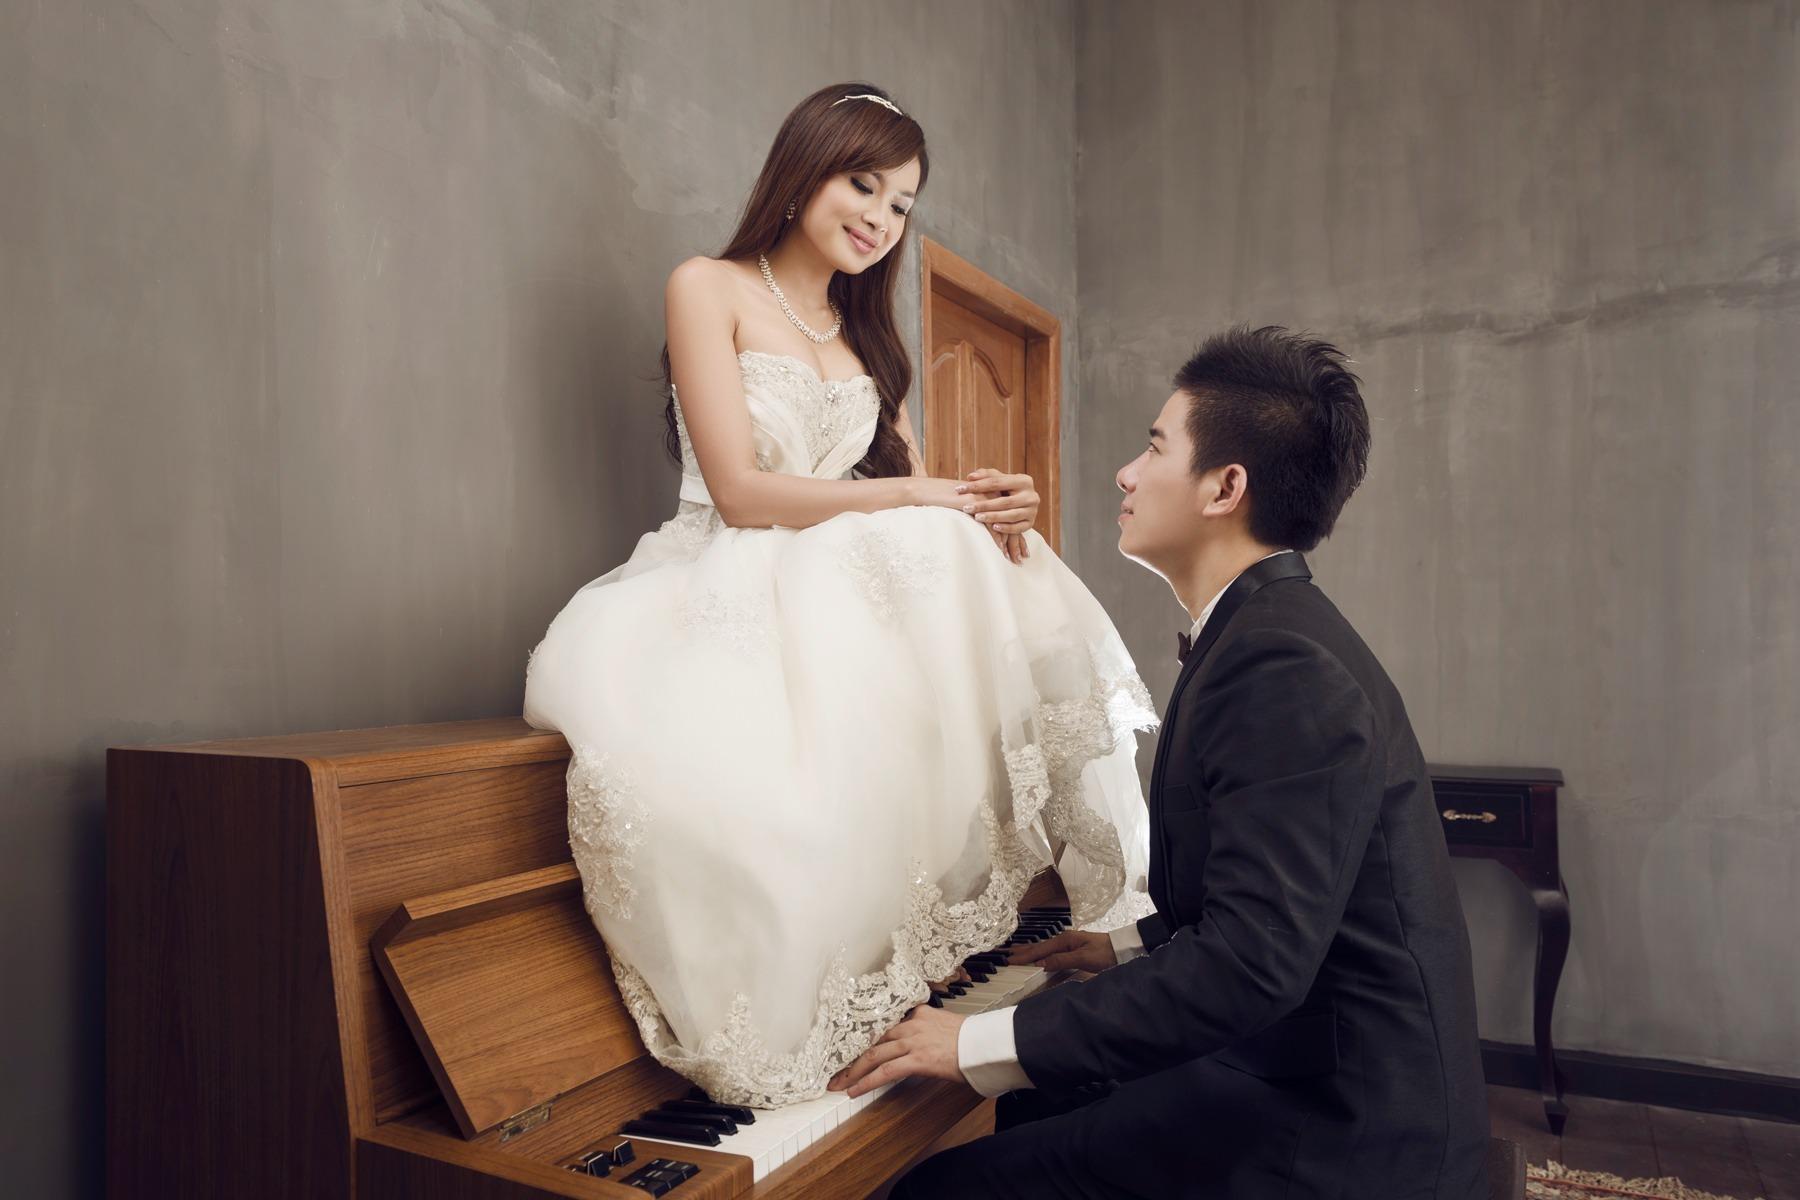 Как правильно вести себя на фотосъемке невесте